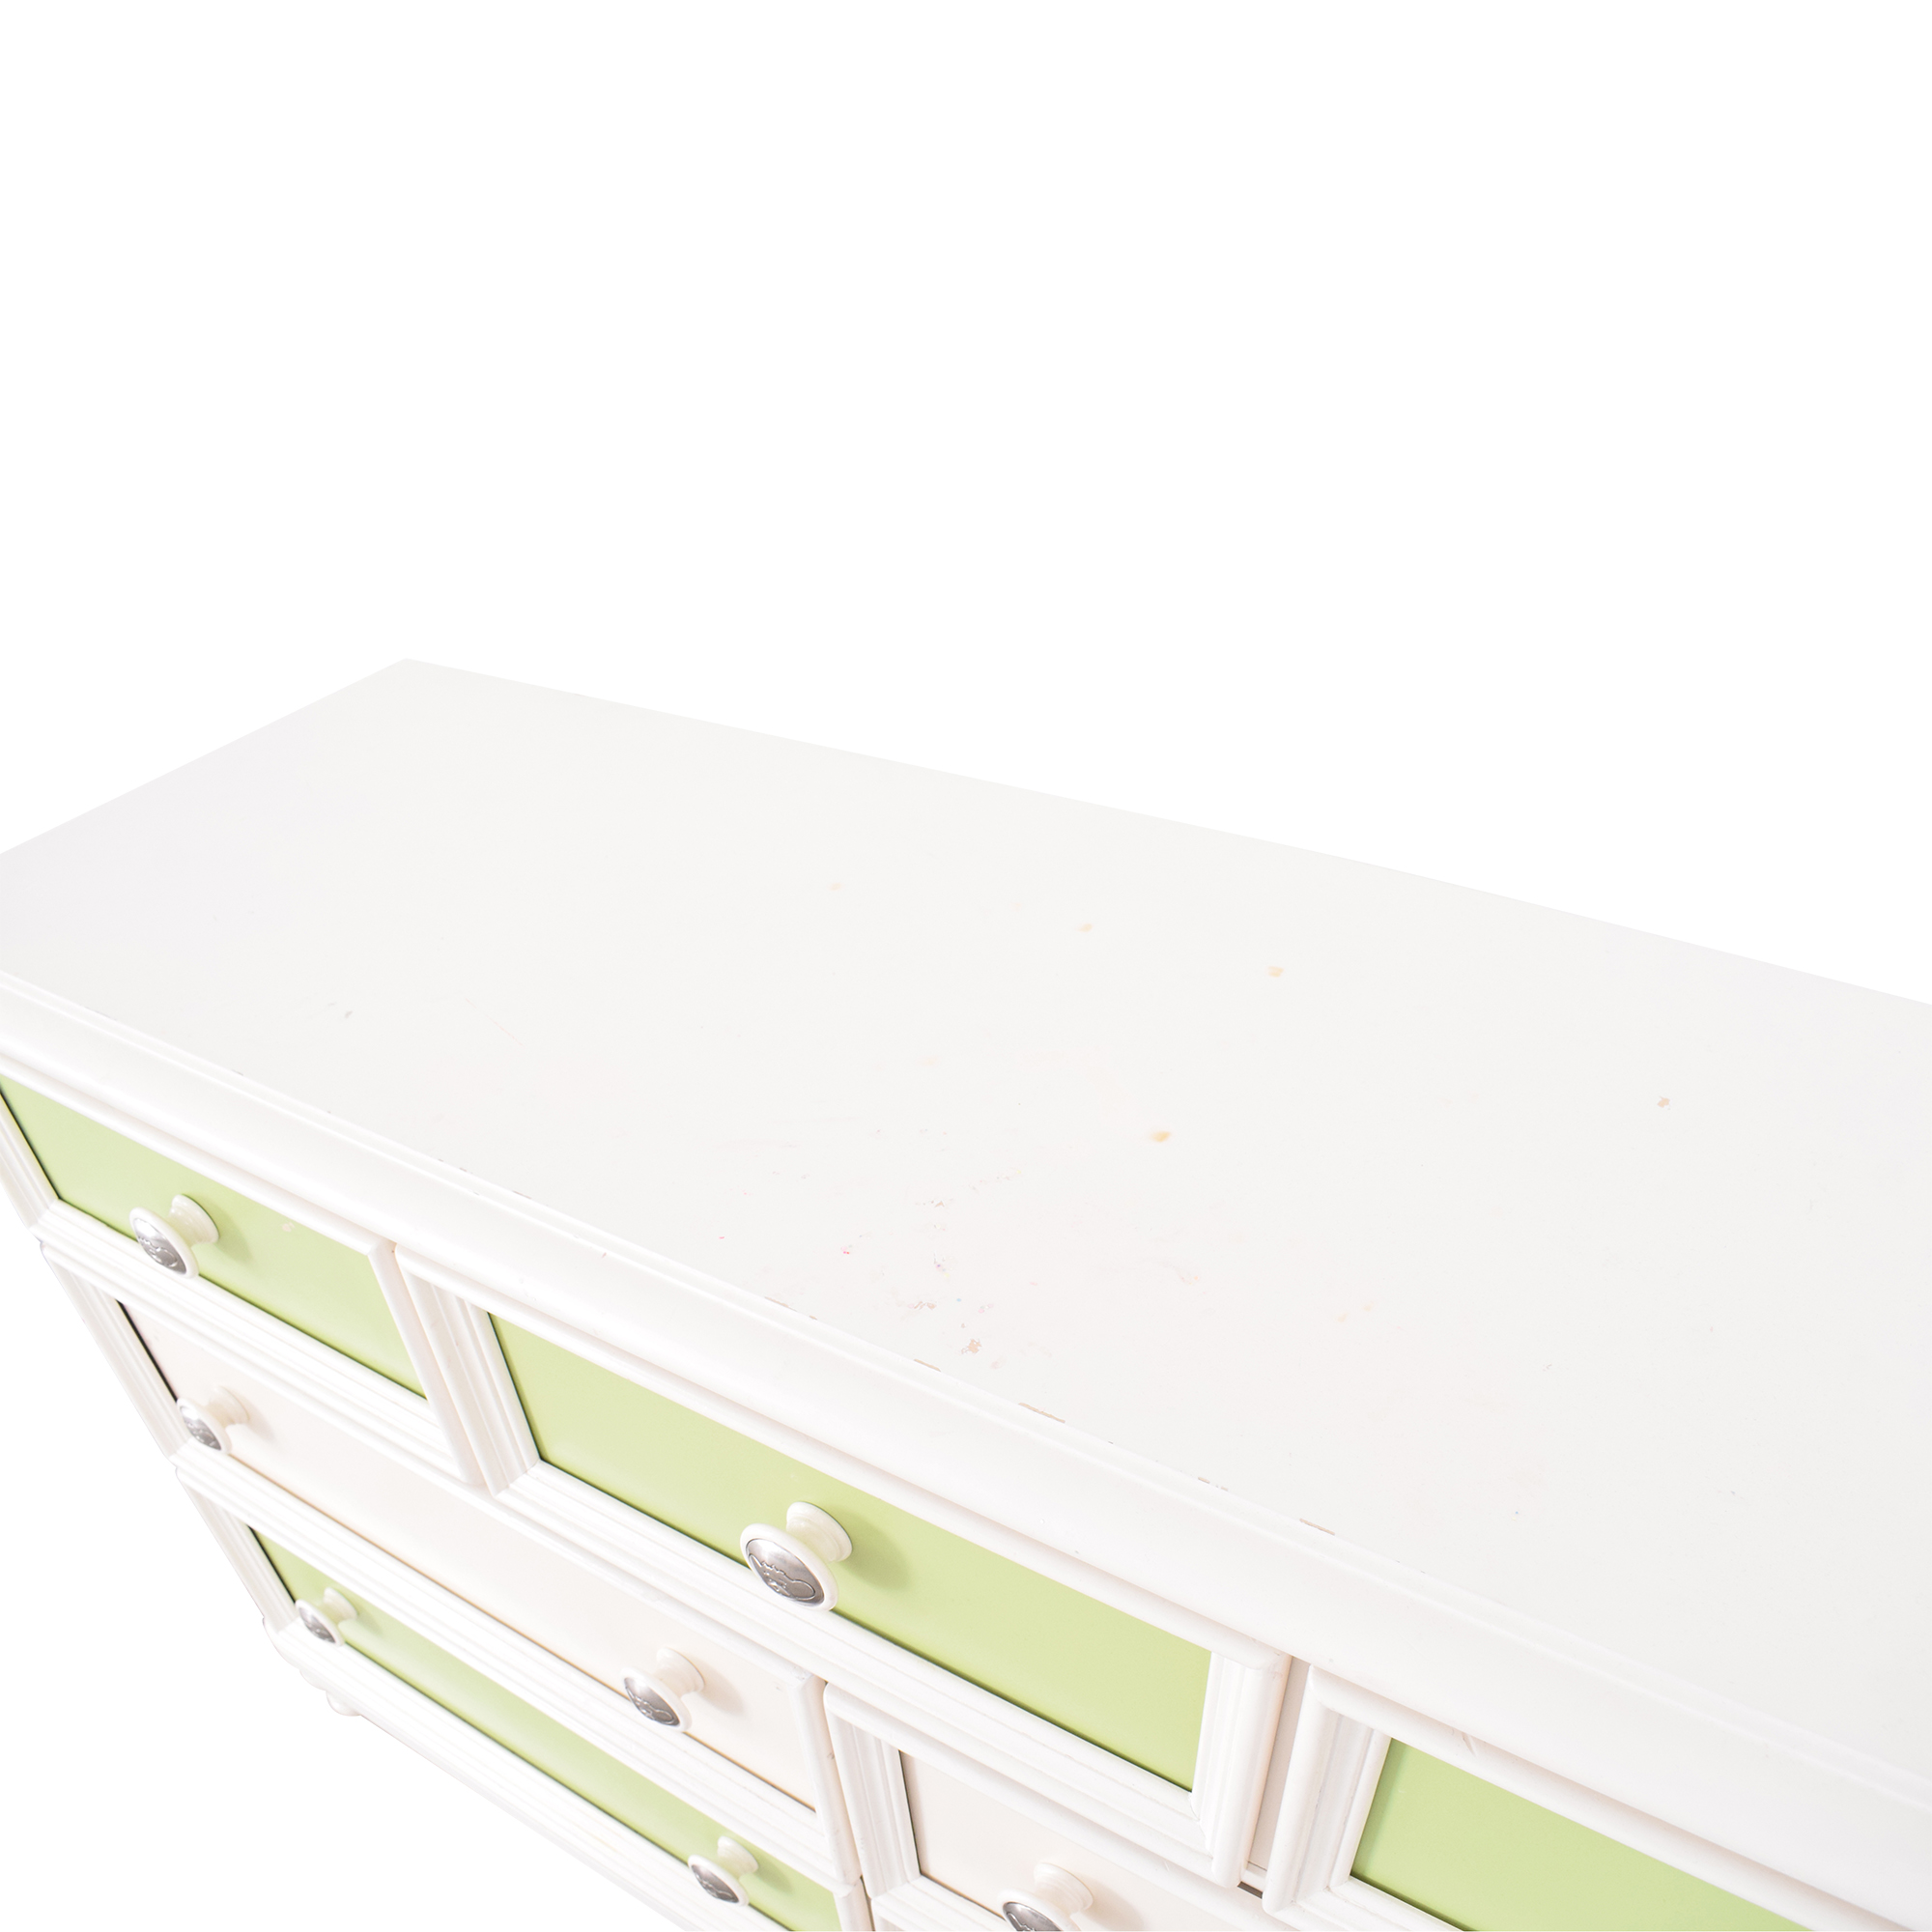 Raymour & Flanigan Raymour & Flanigan Colored Panel Dresser used